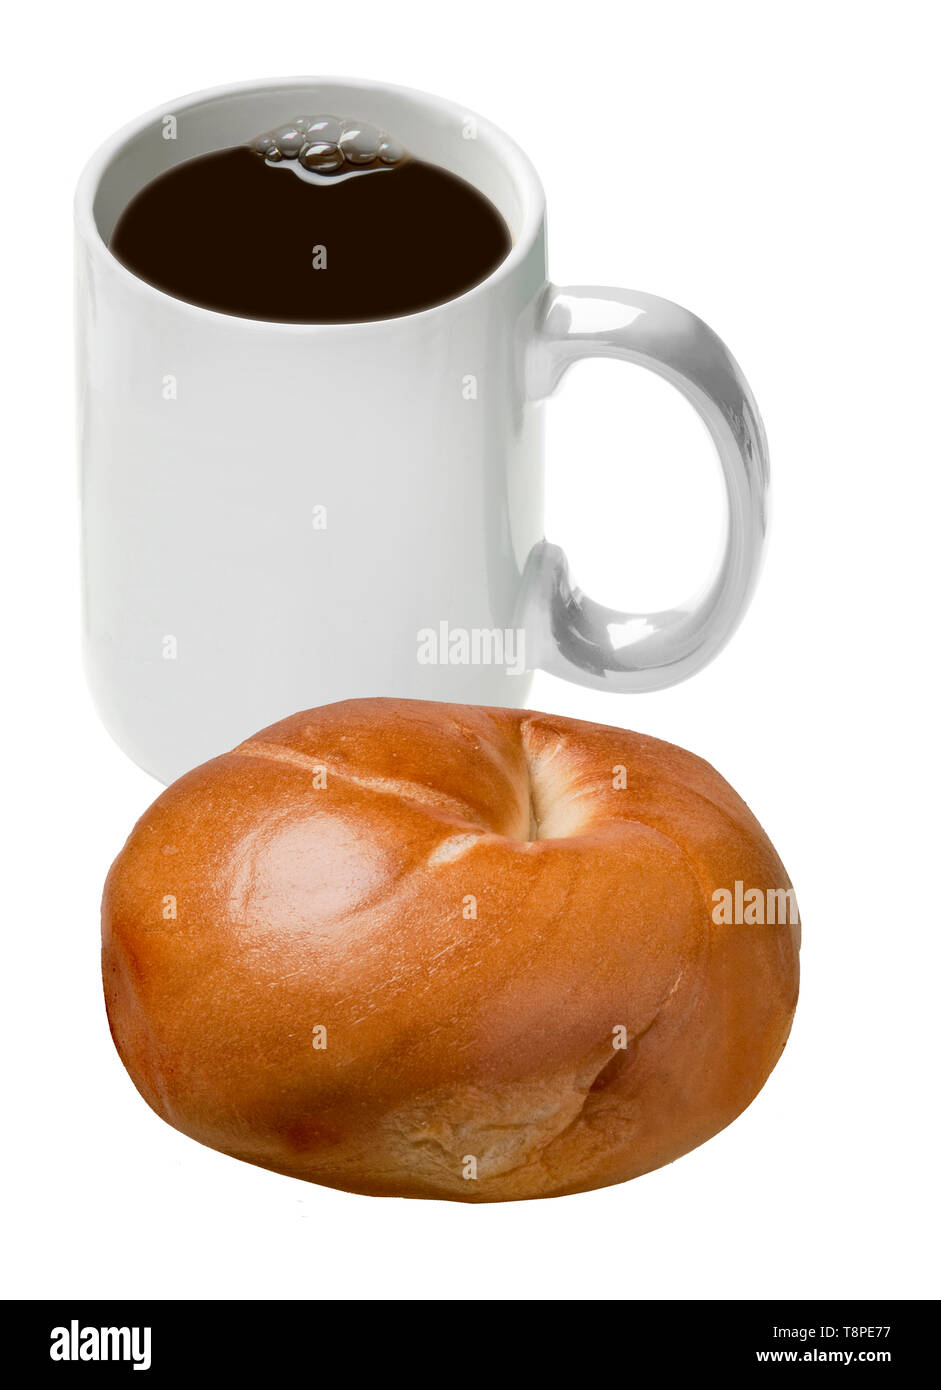 kaffe bagel dating